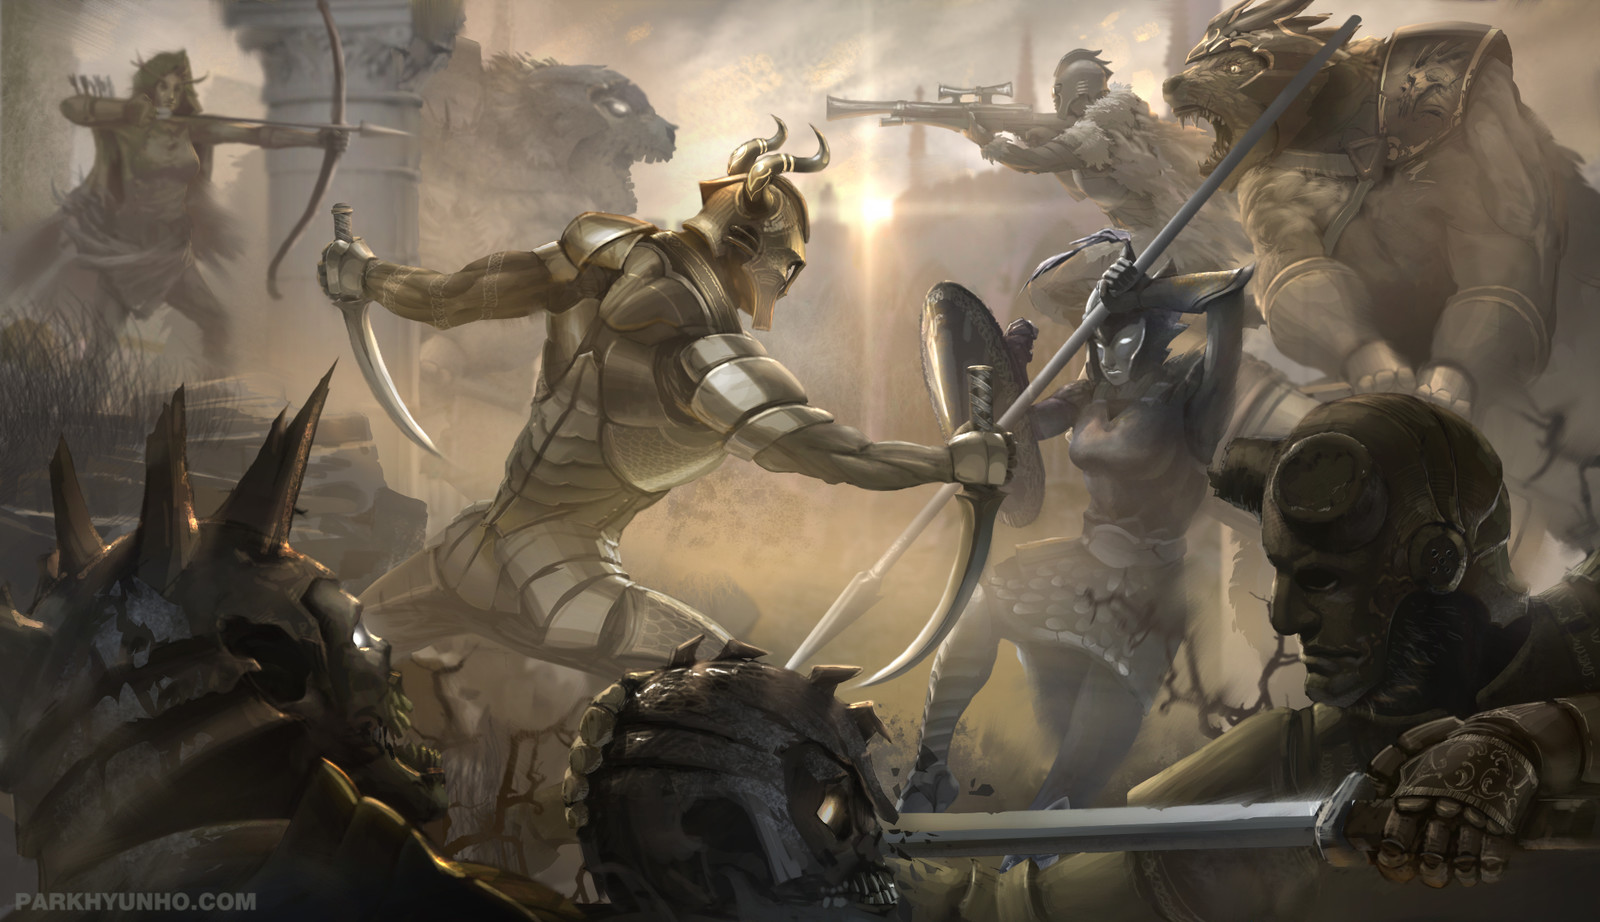 Battle of sunset